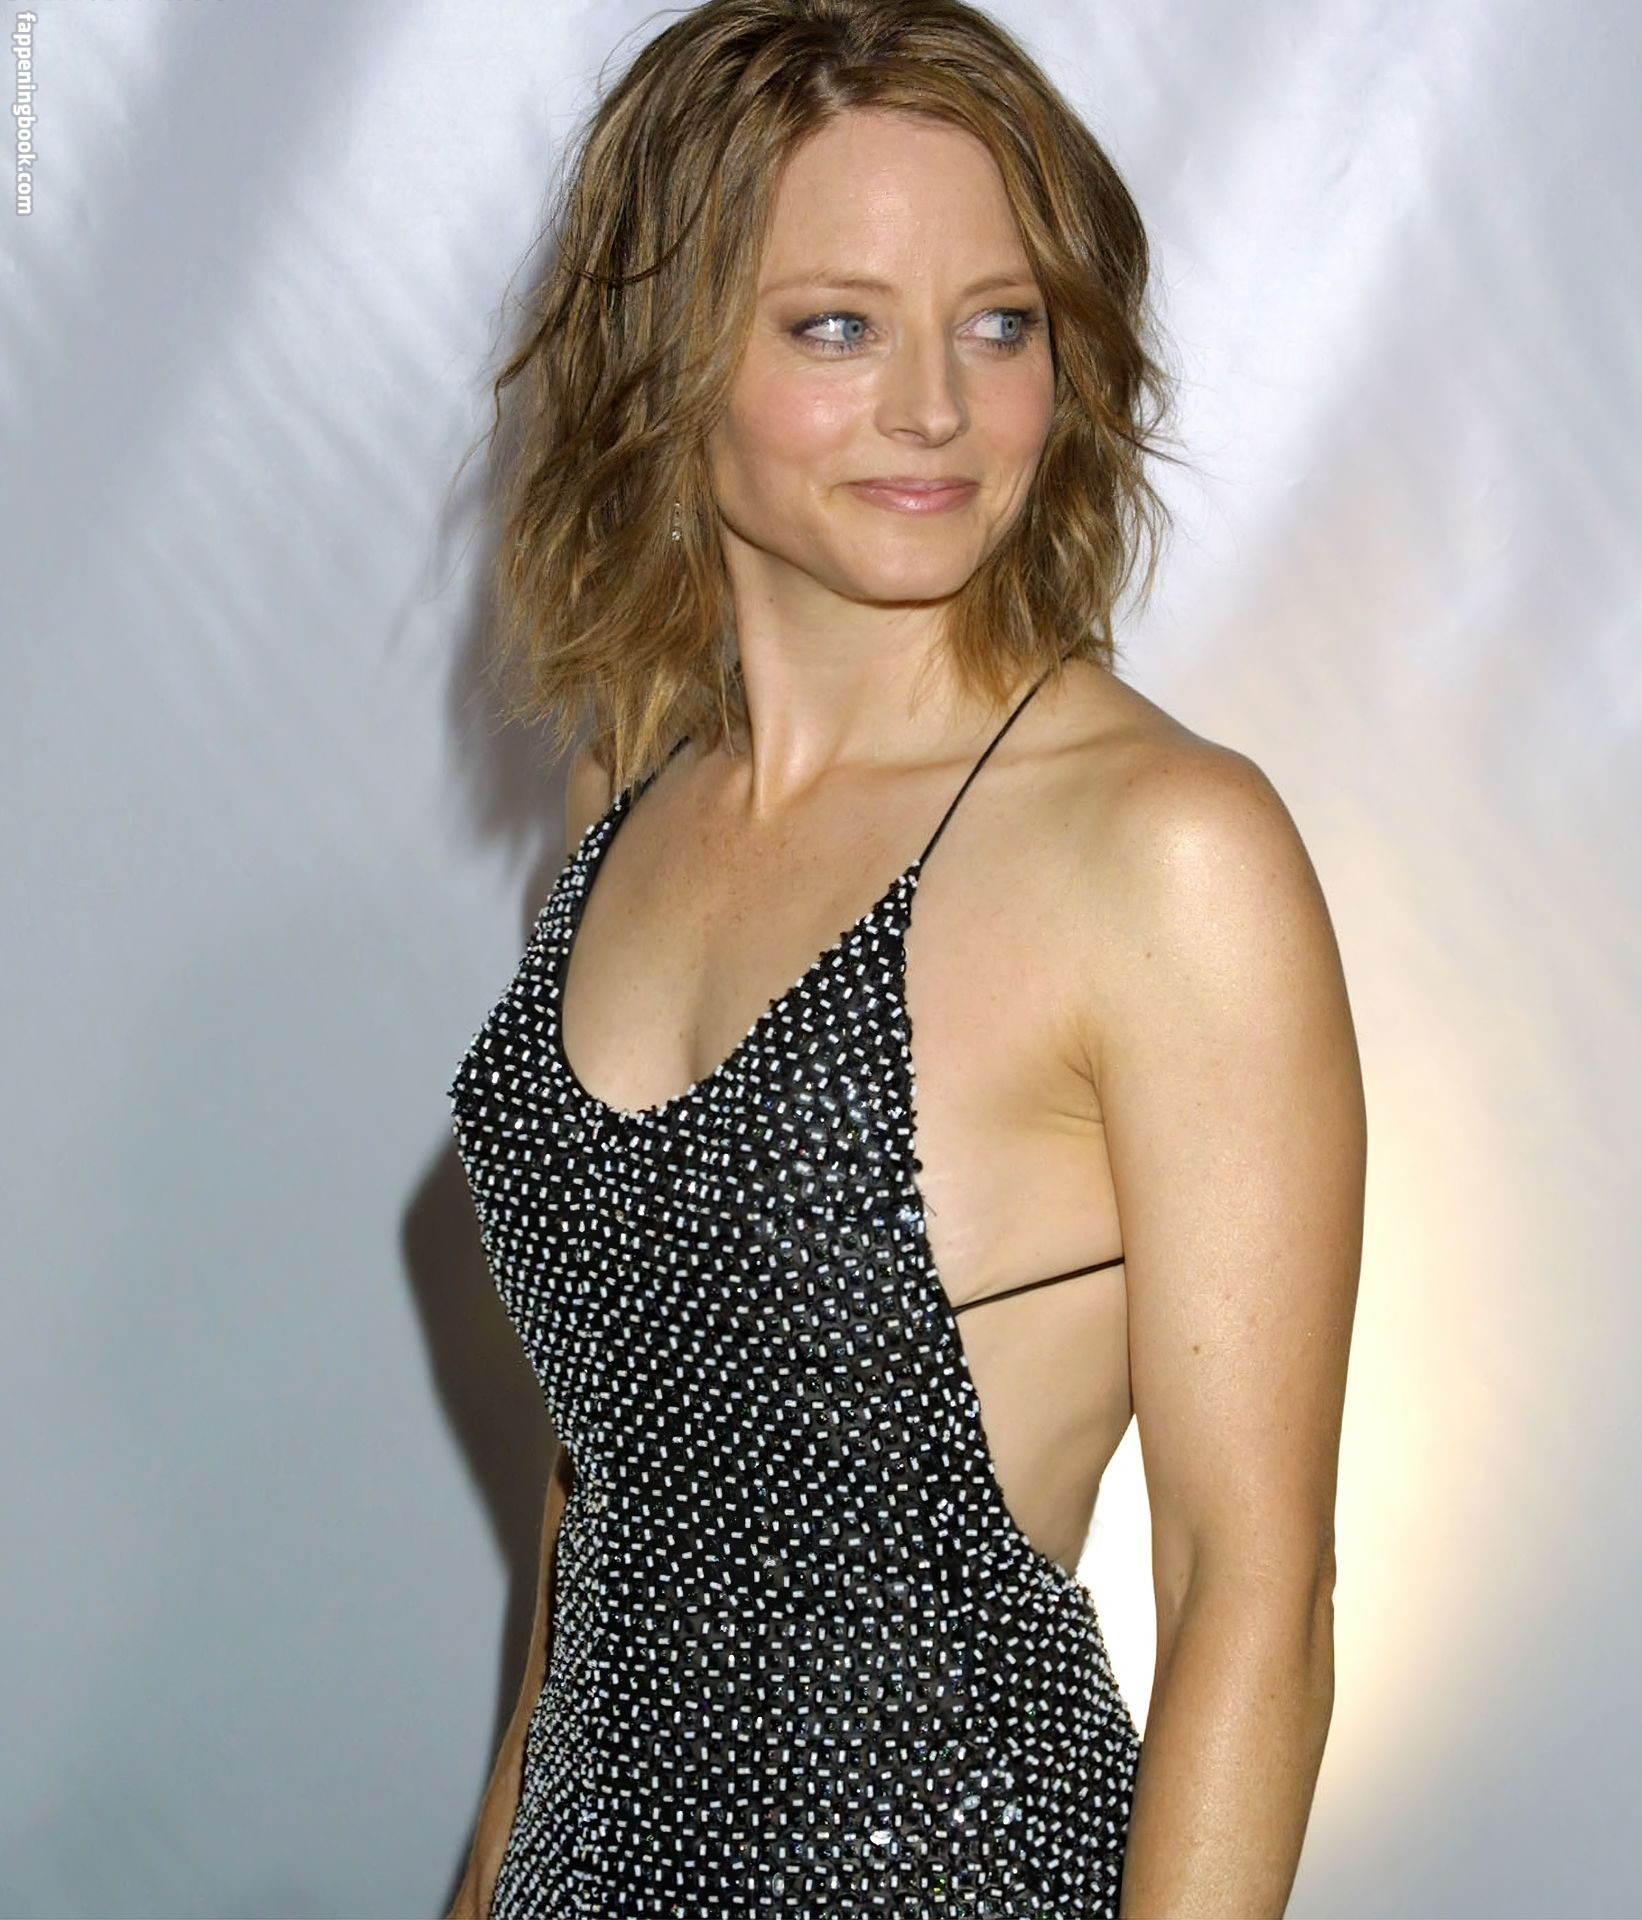 Jodie Foster nude.: yangur — LiveJournal